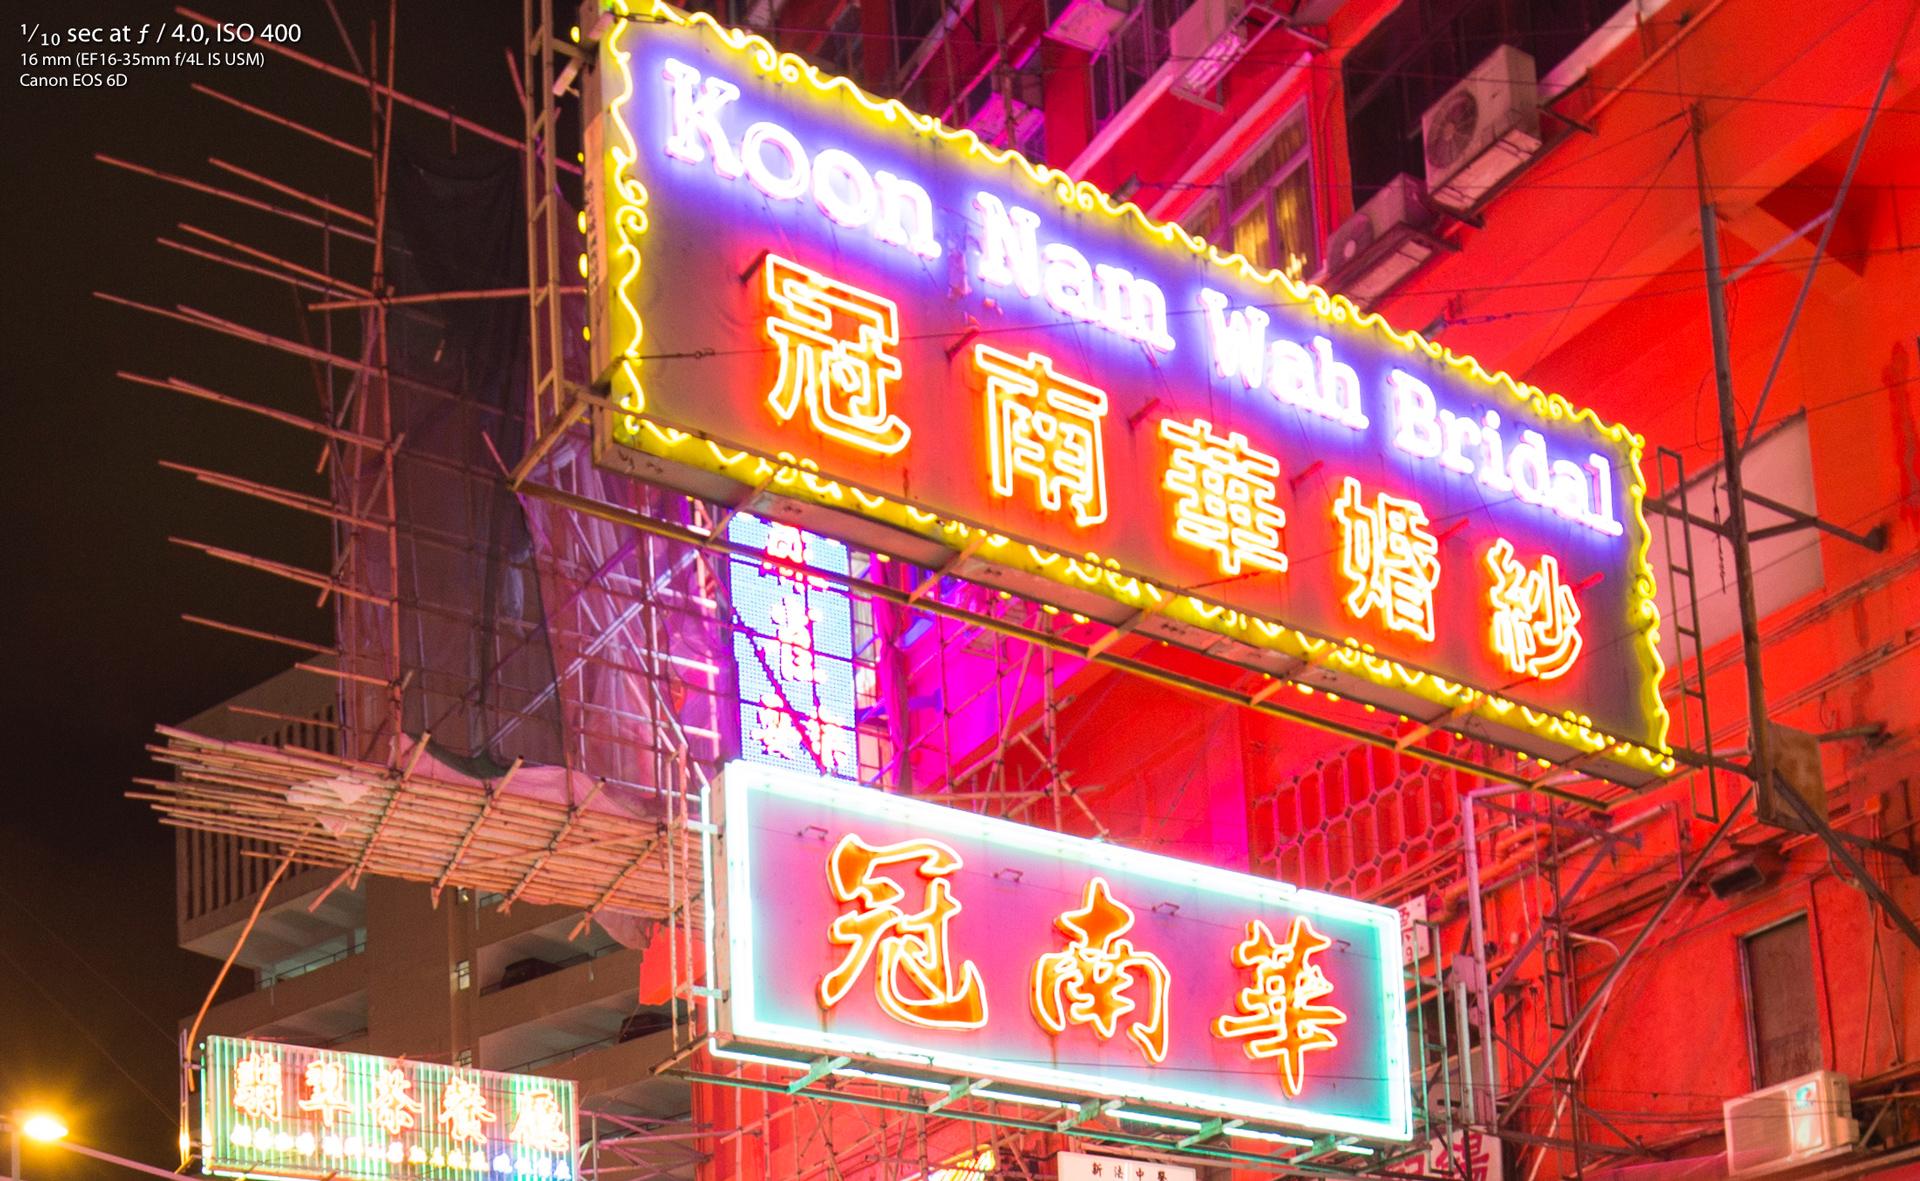 Canon 16-35mm F4 IS Review Hong Kong at Night 3